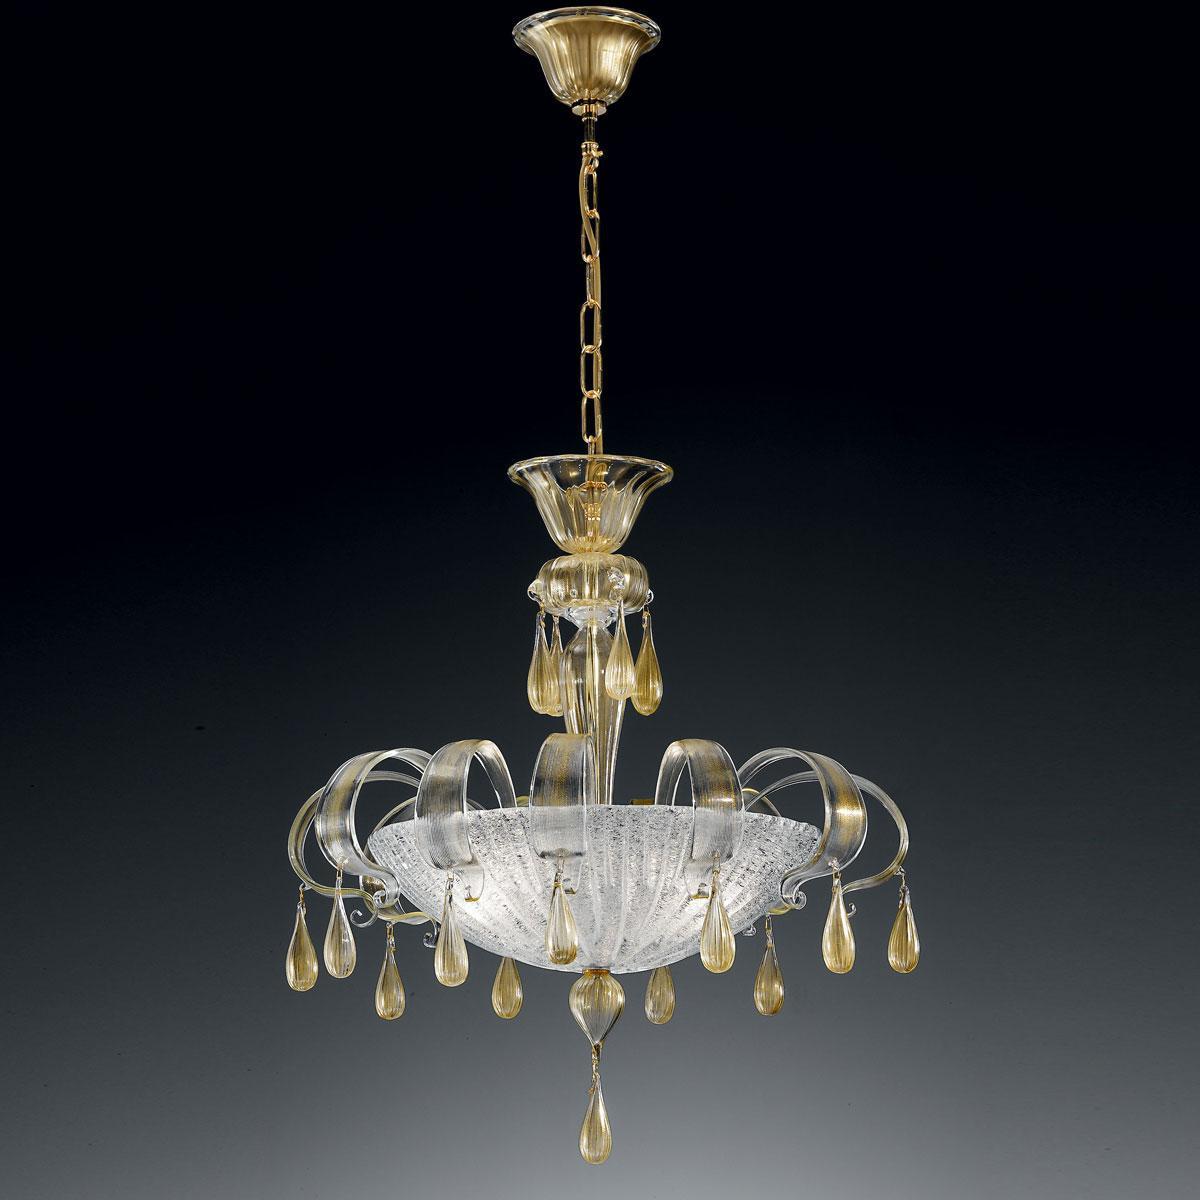 """Irma"" suspension en verre de Murano - 3 lumières - transparent et or"